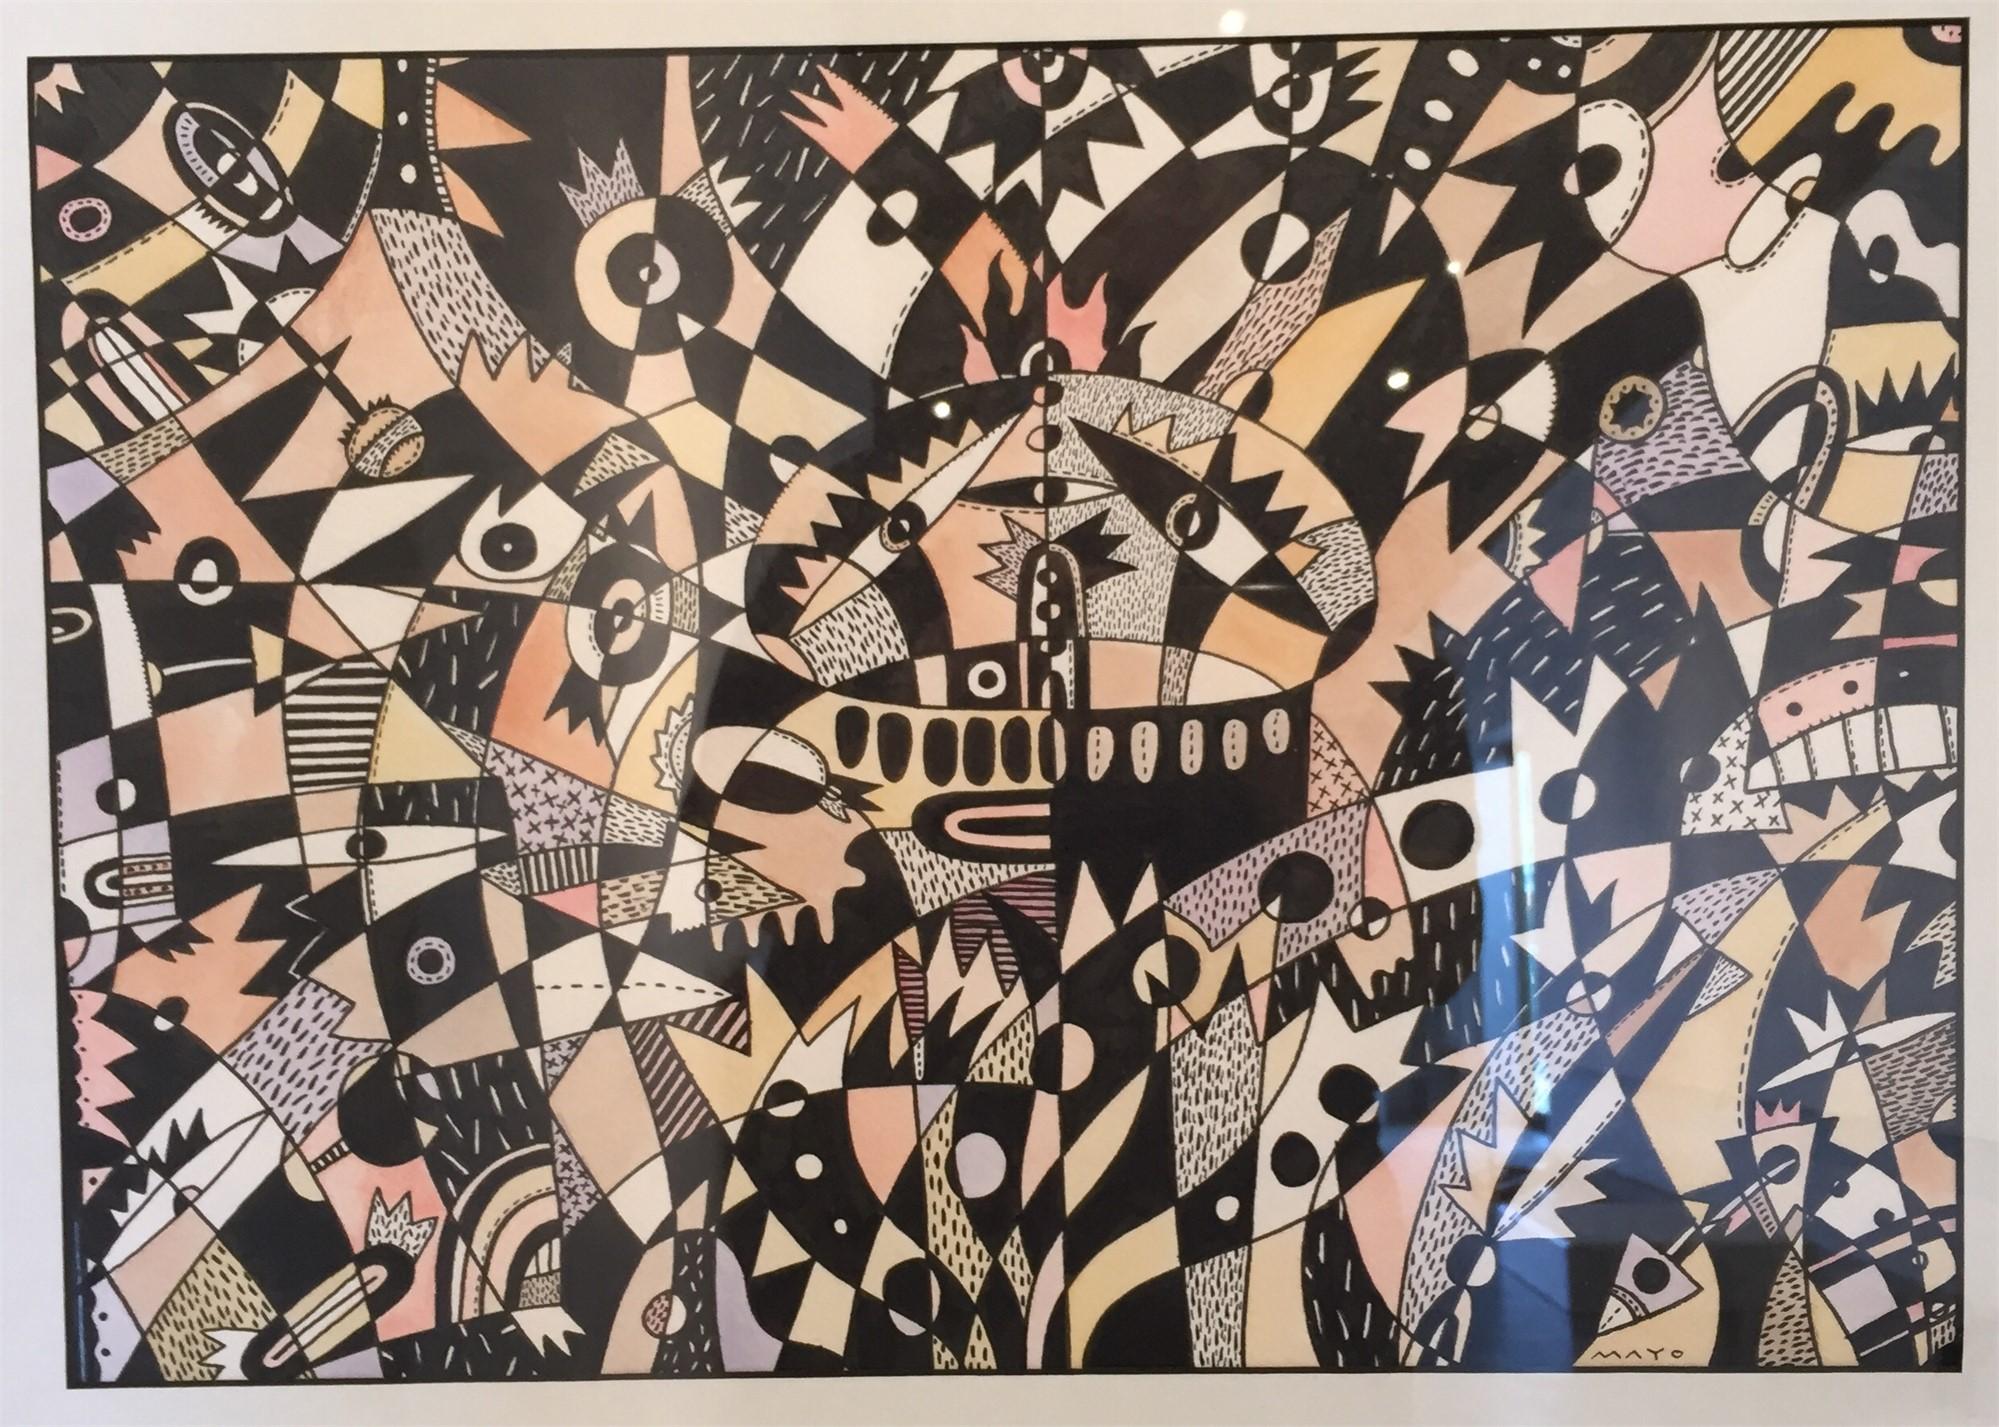 El Chaman by Christopher Mayo Mayes